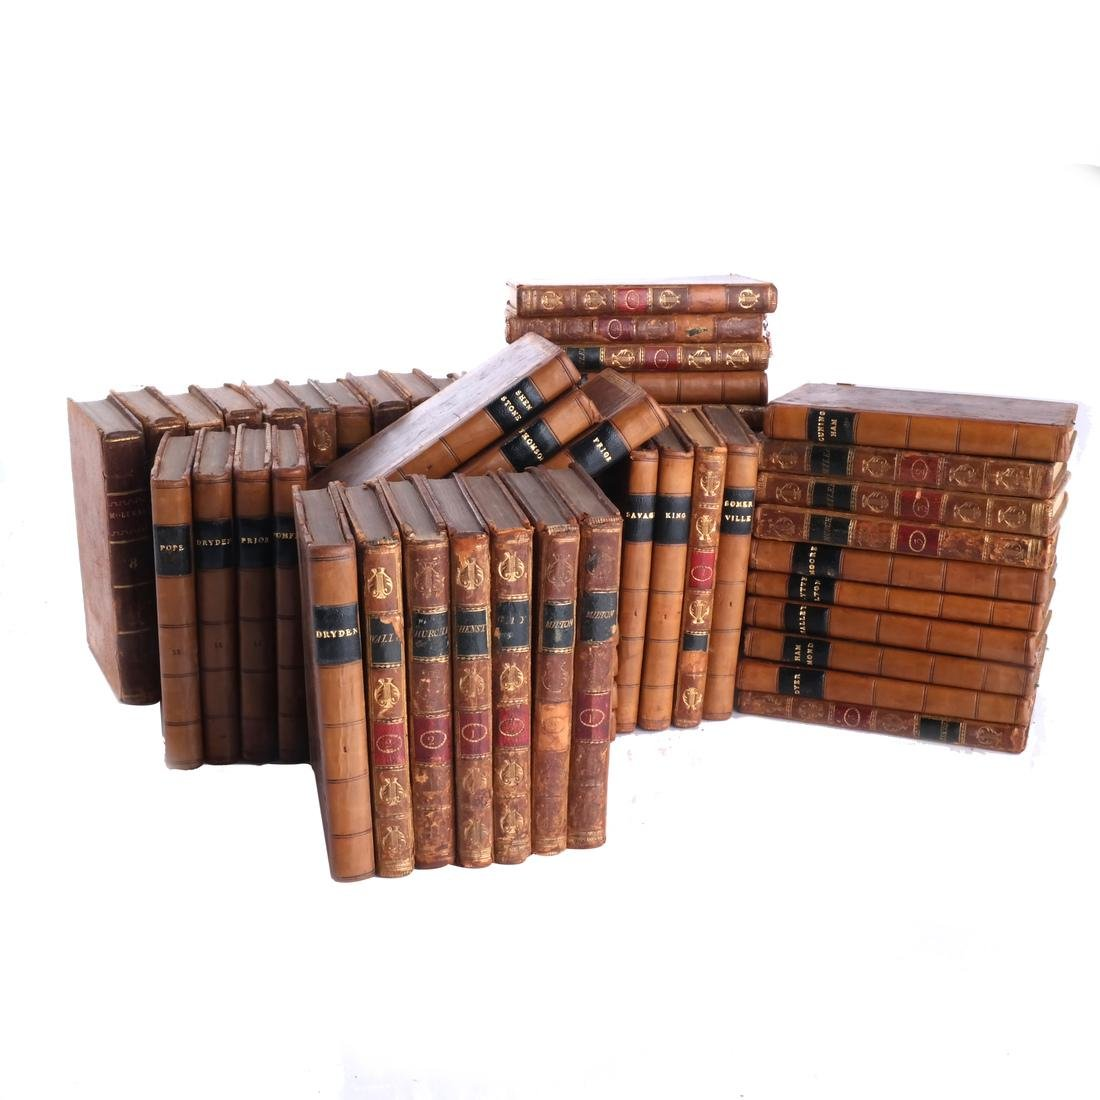 Books: 50+ Volumes